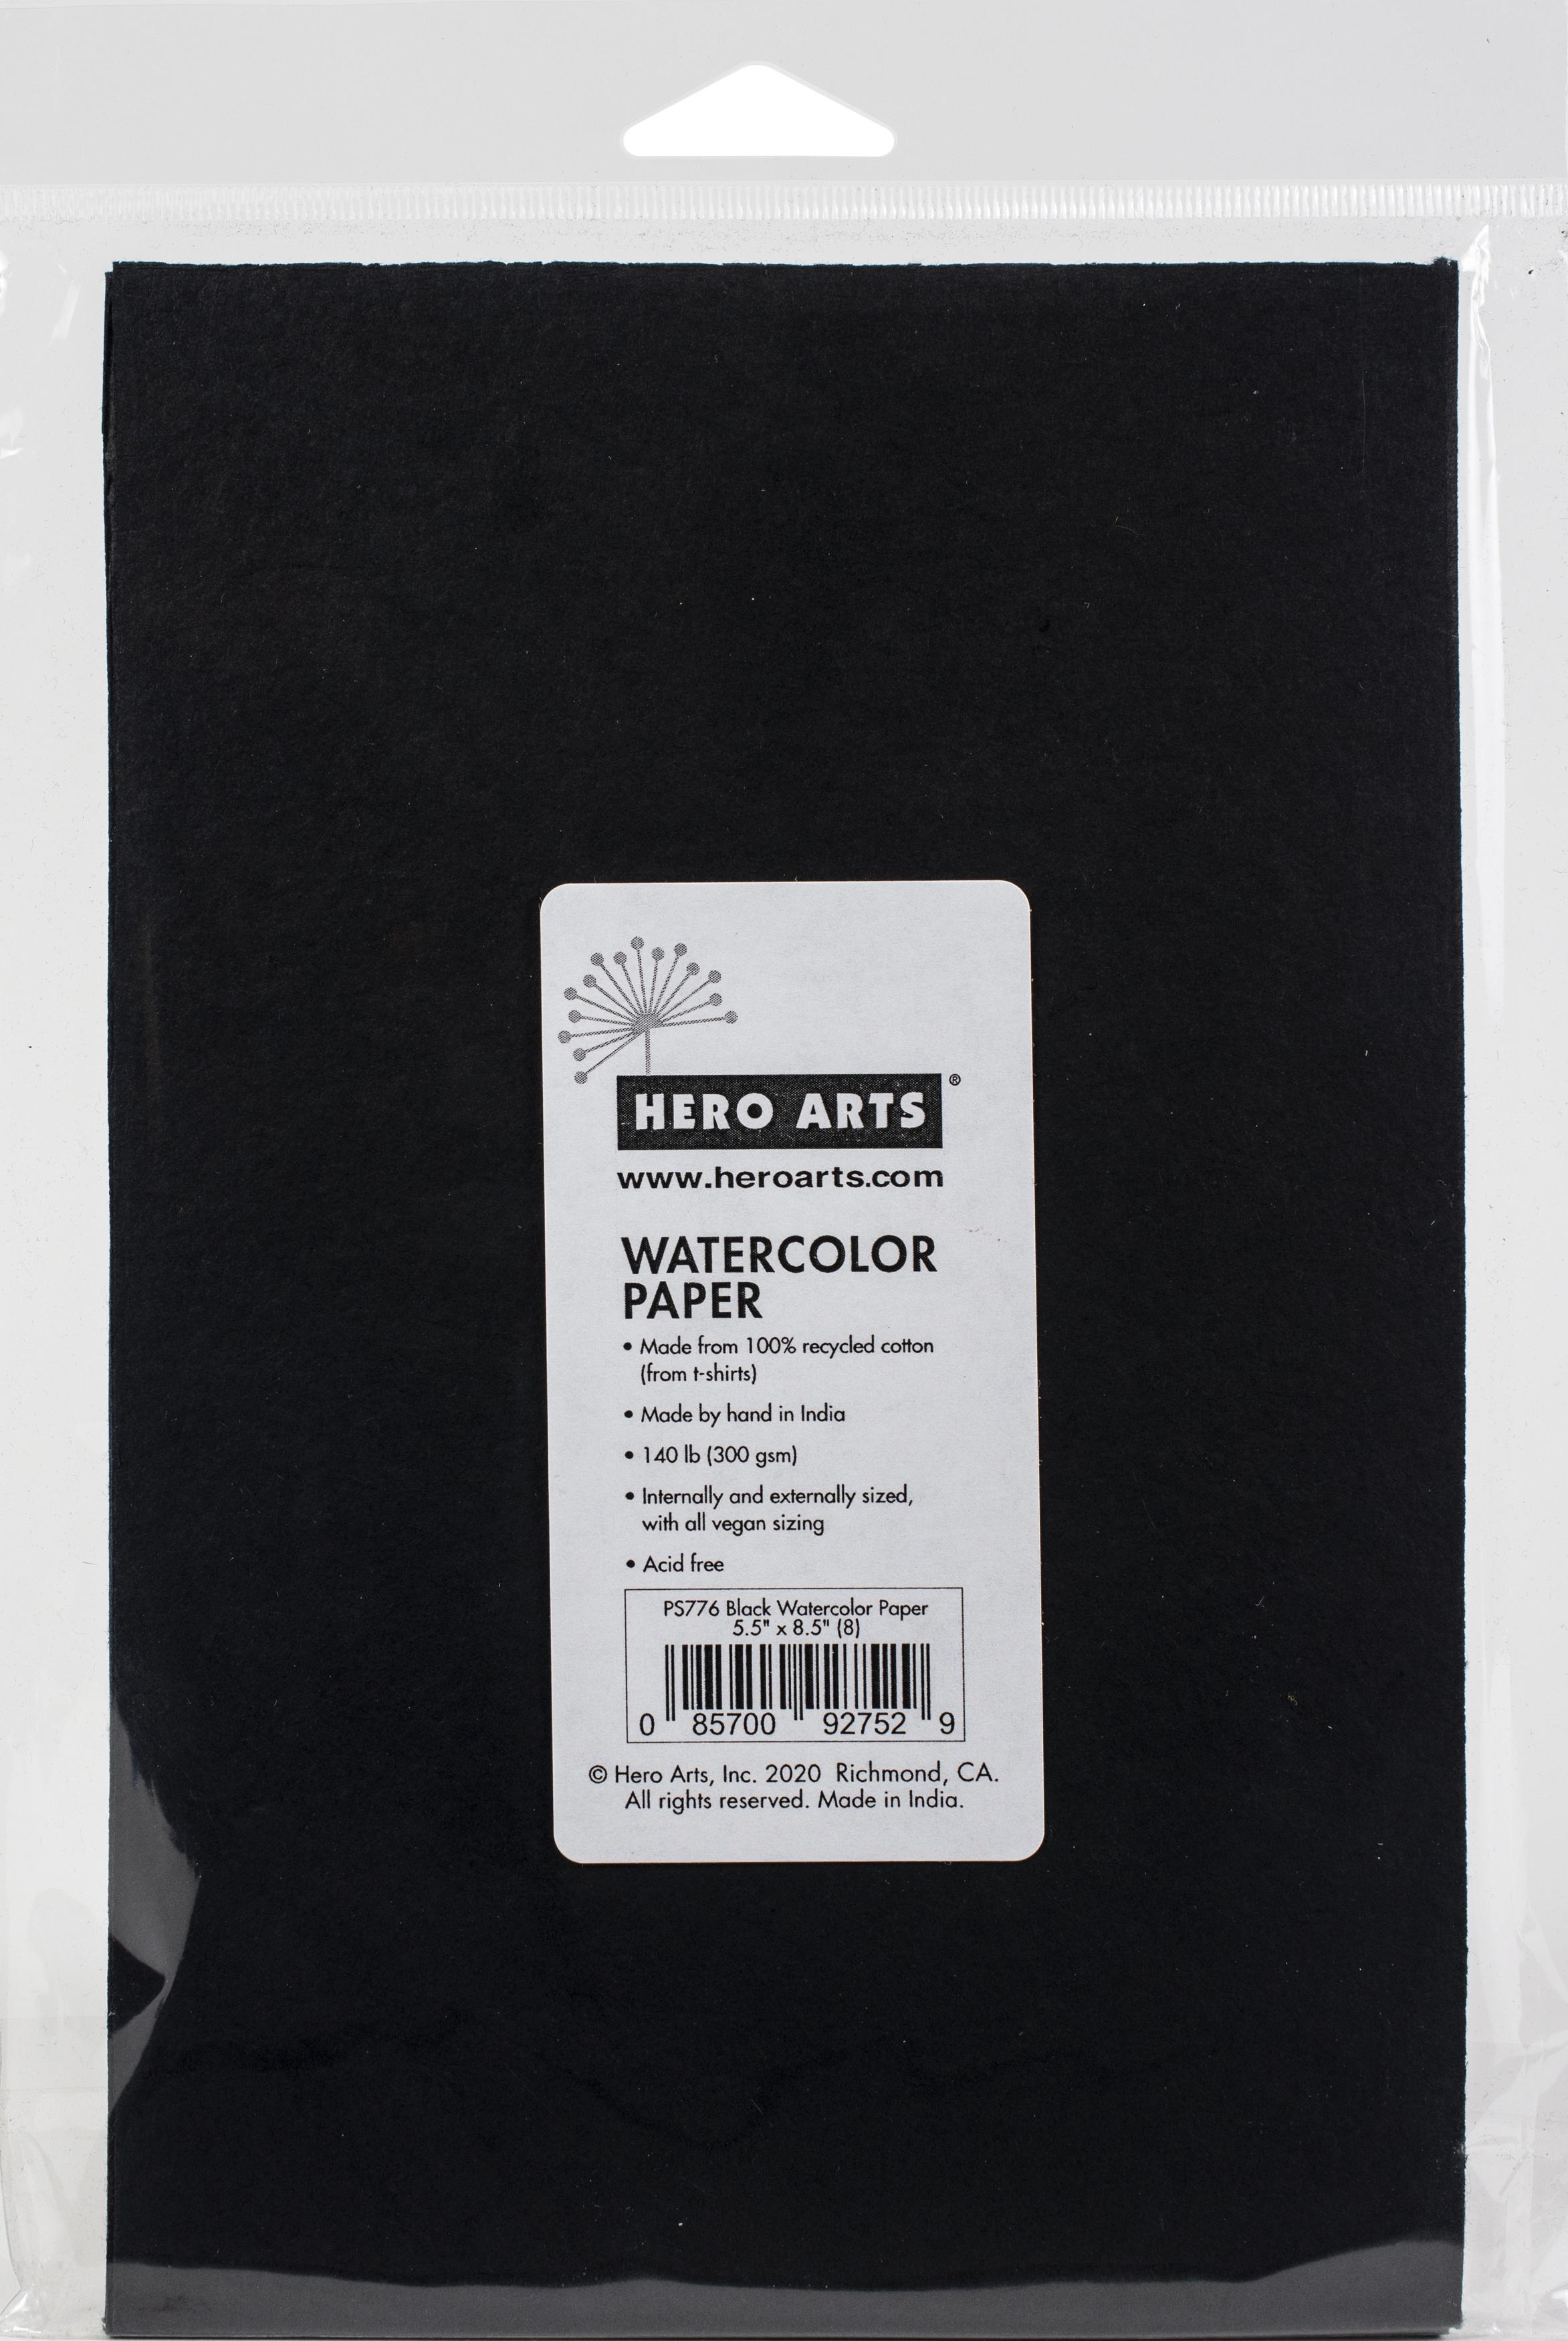 Hero Arts - Watercolor Paper, Black, 5.5 x 8.5, 8/Pkg